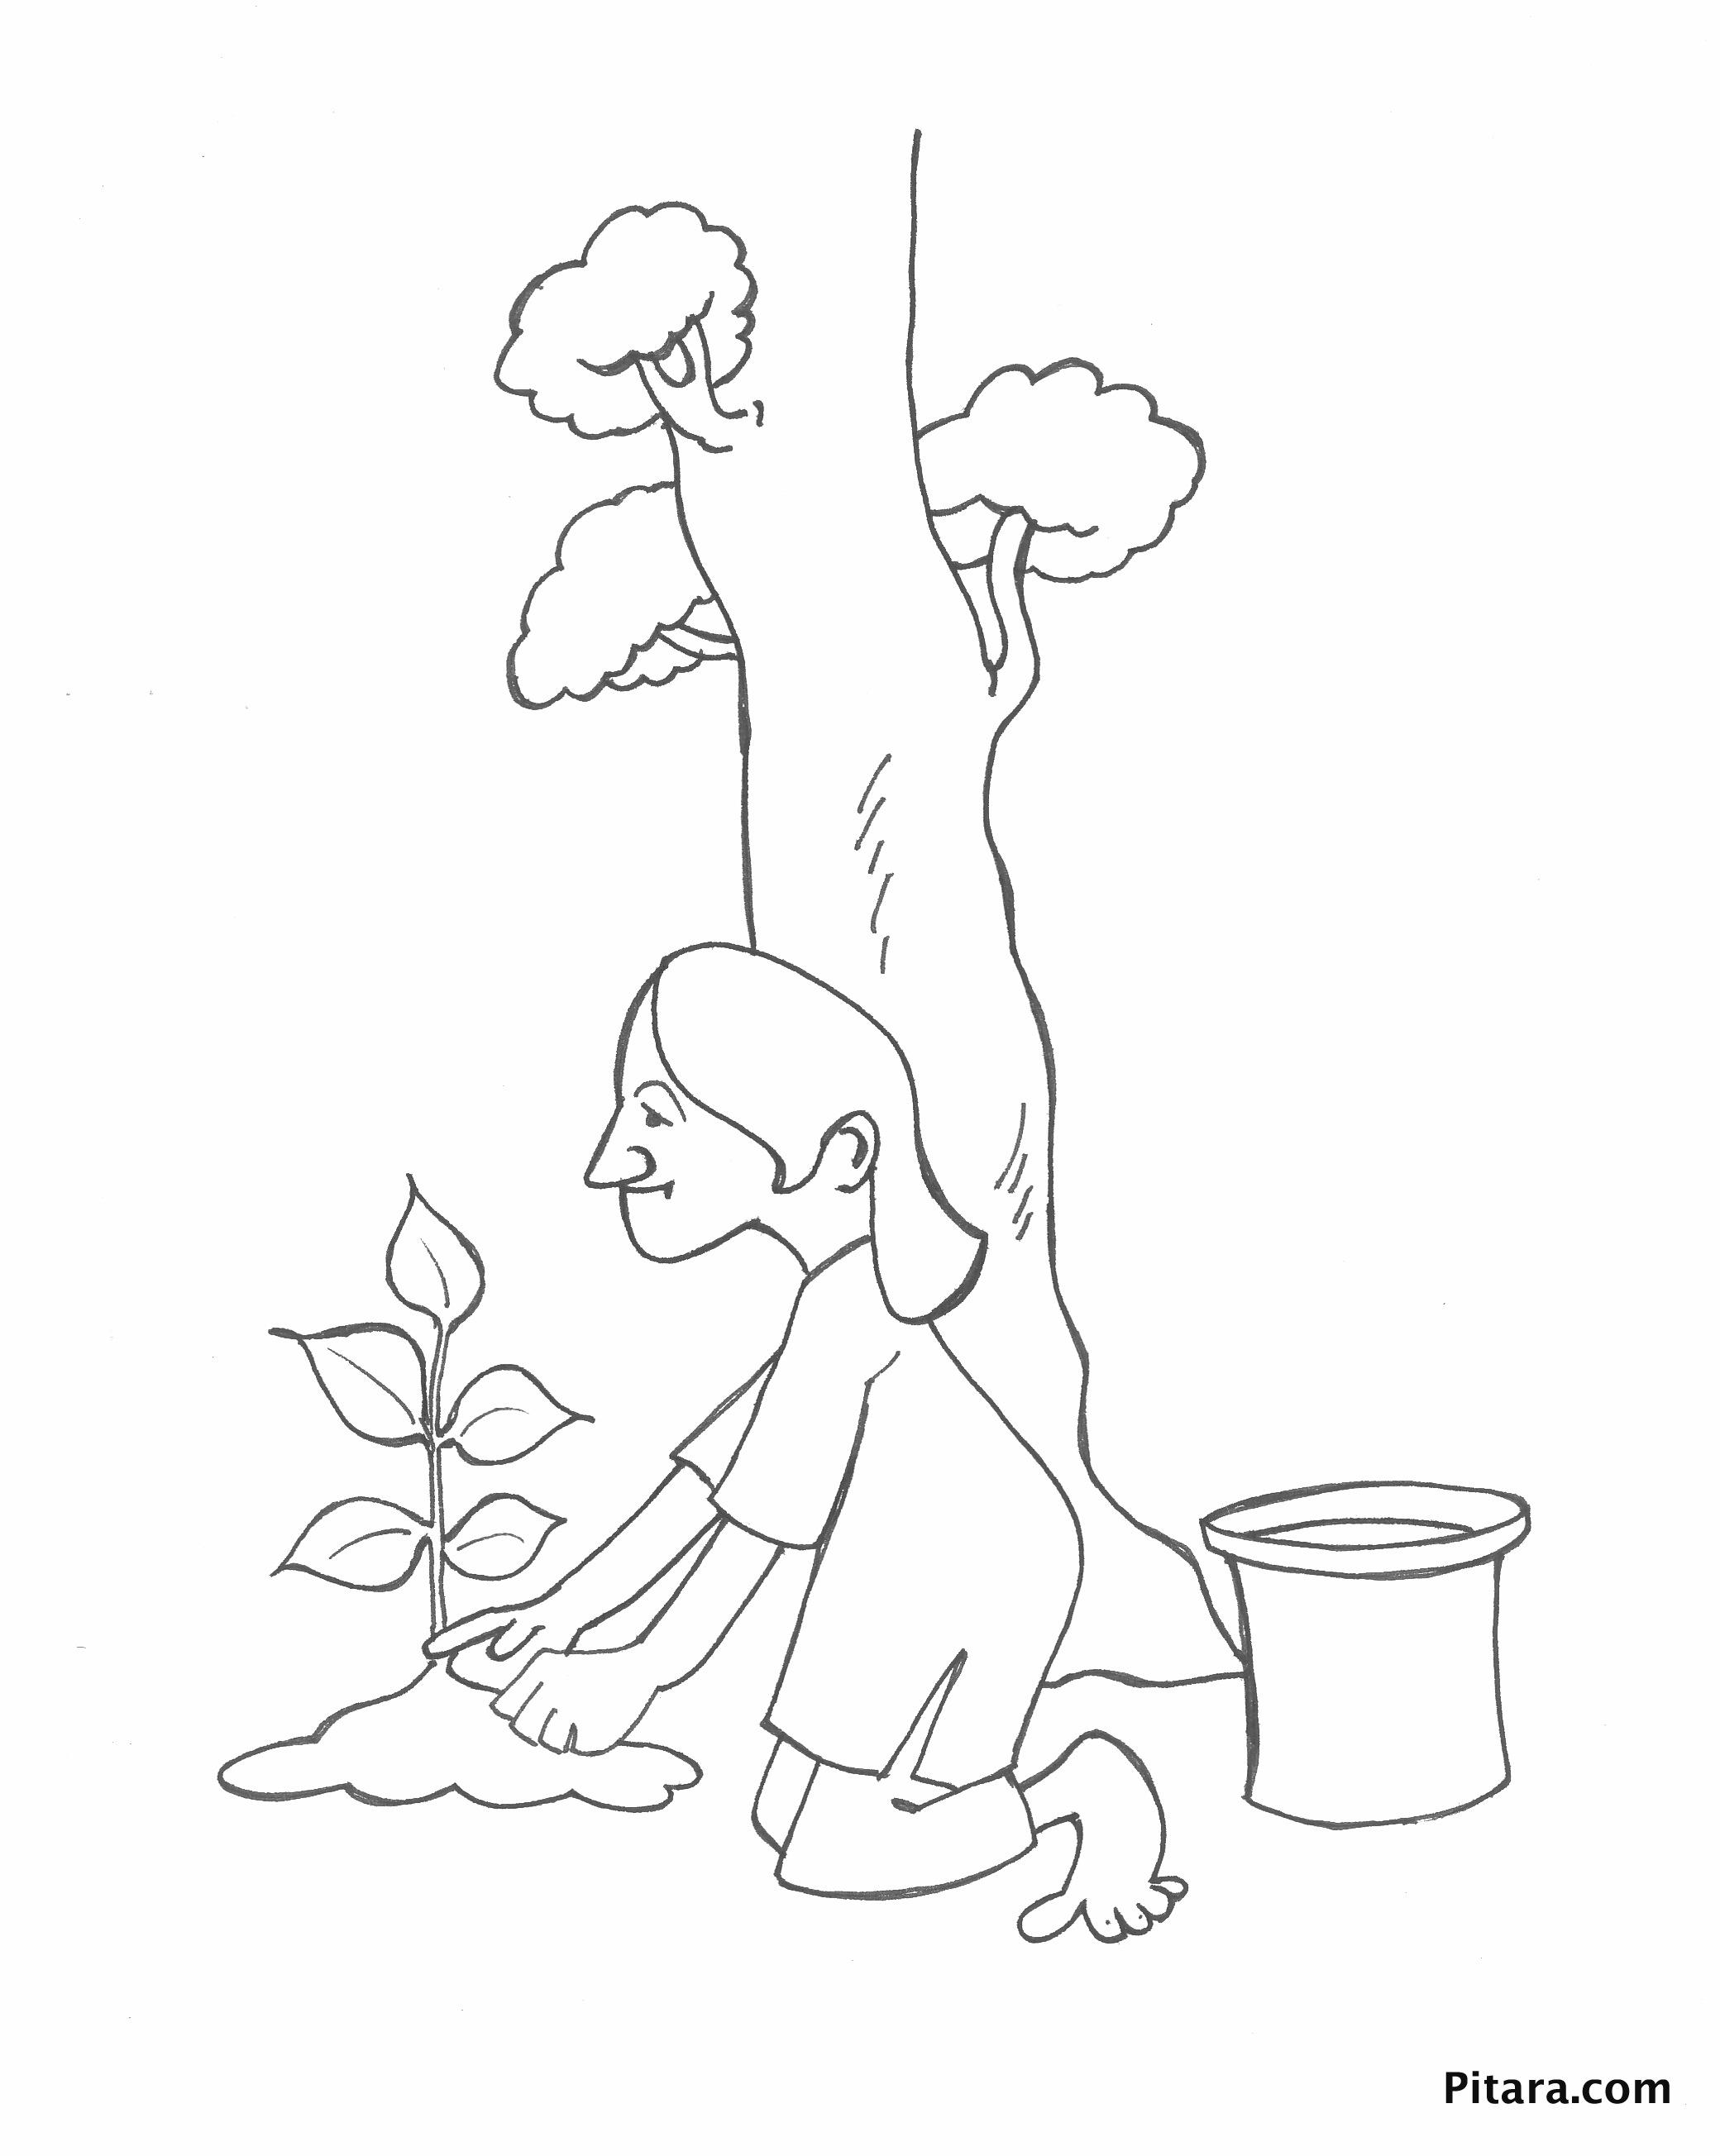 Planting a sapling